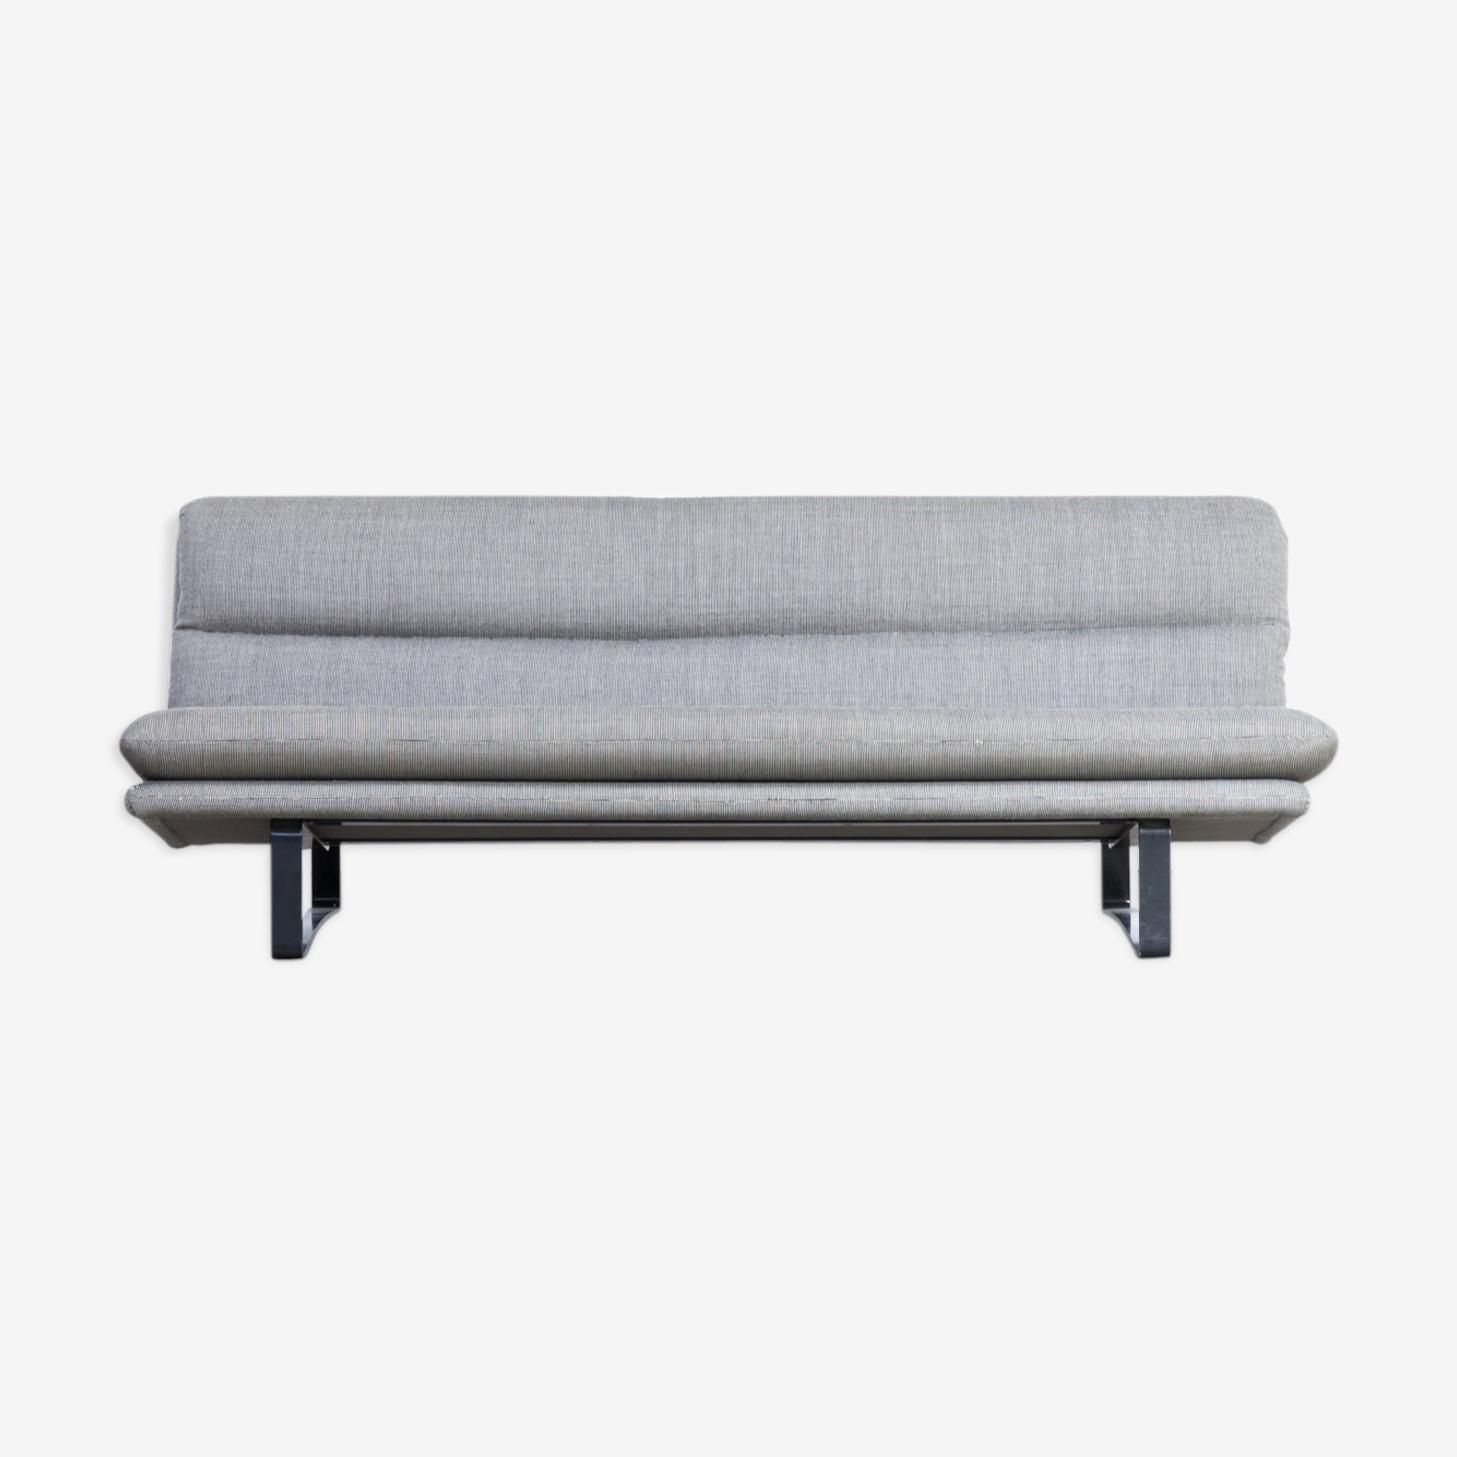 Kho Liang Ie C684 grey fabric three seat sofa for Artifort